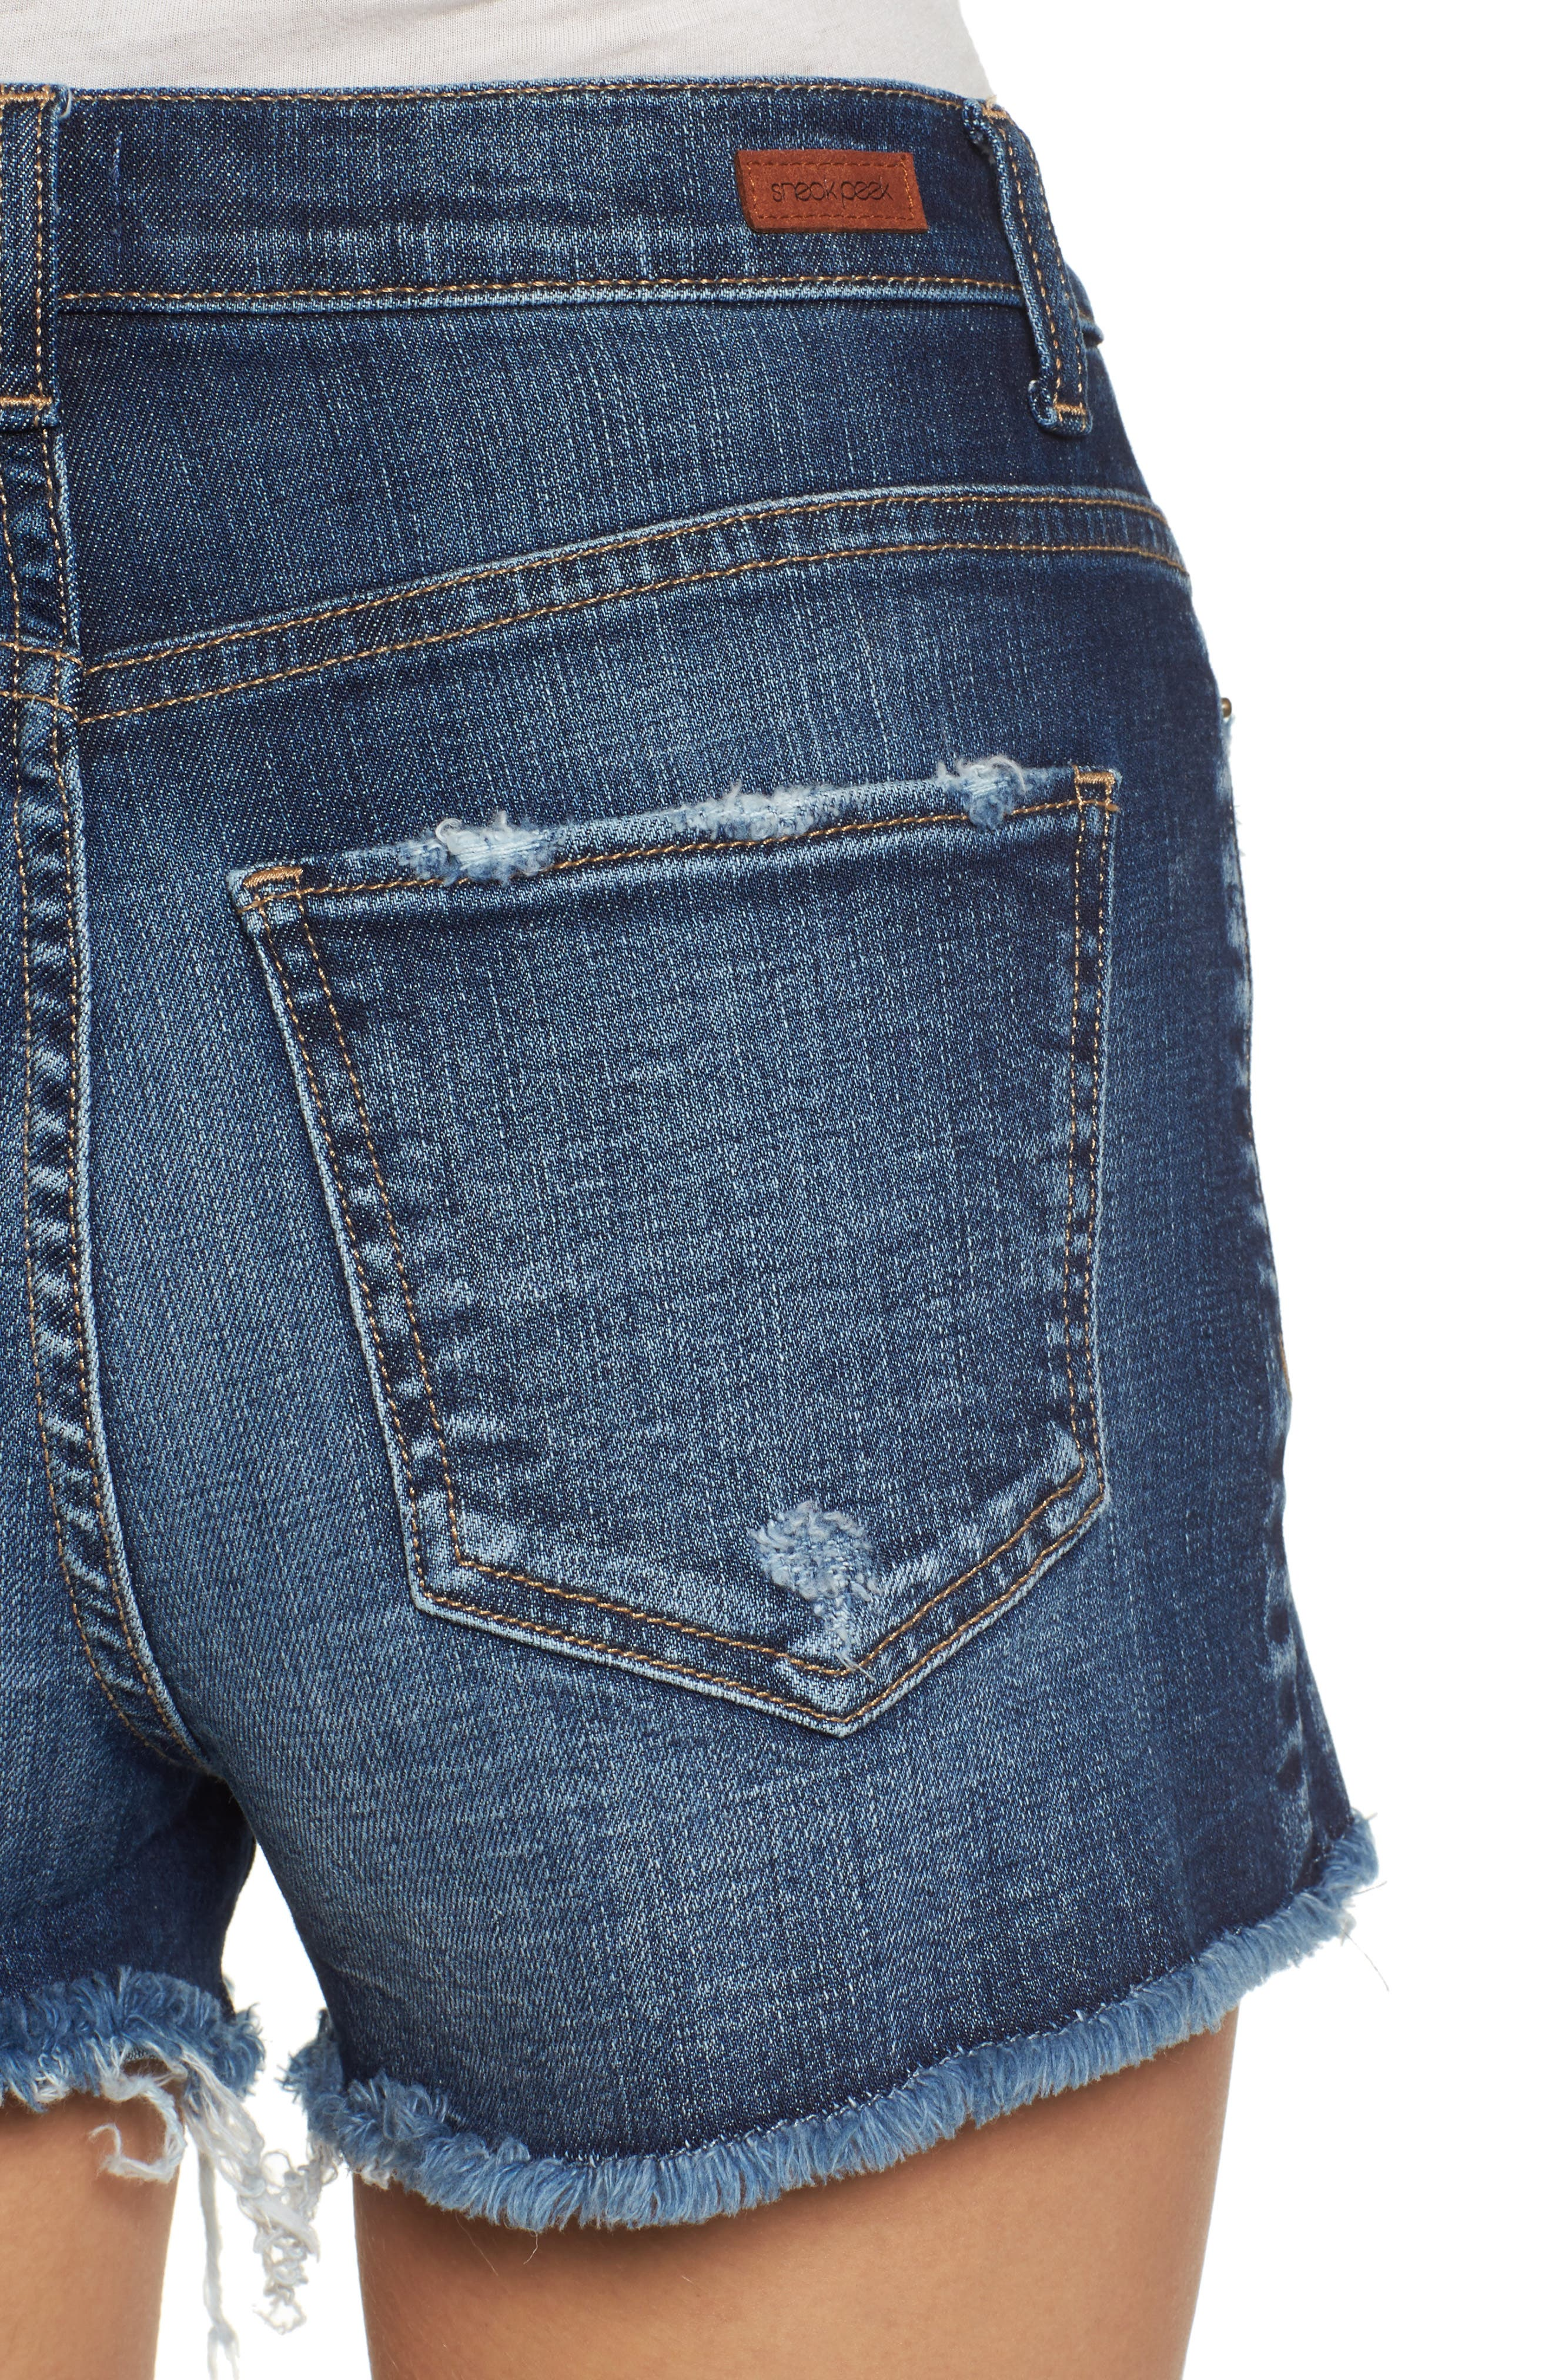 High Rise Fray Ripped Cutoff Shorts,                             Alternate thumbnail 4, color,                             Medium